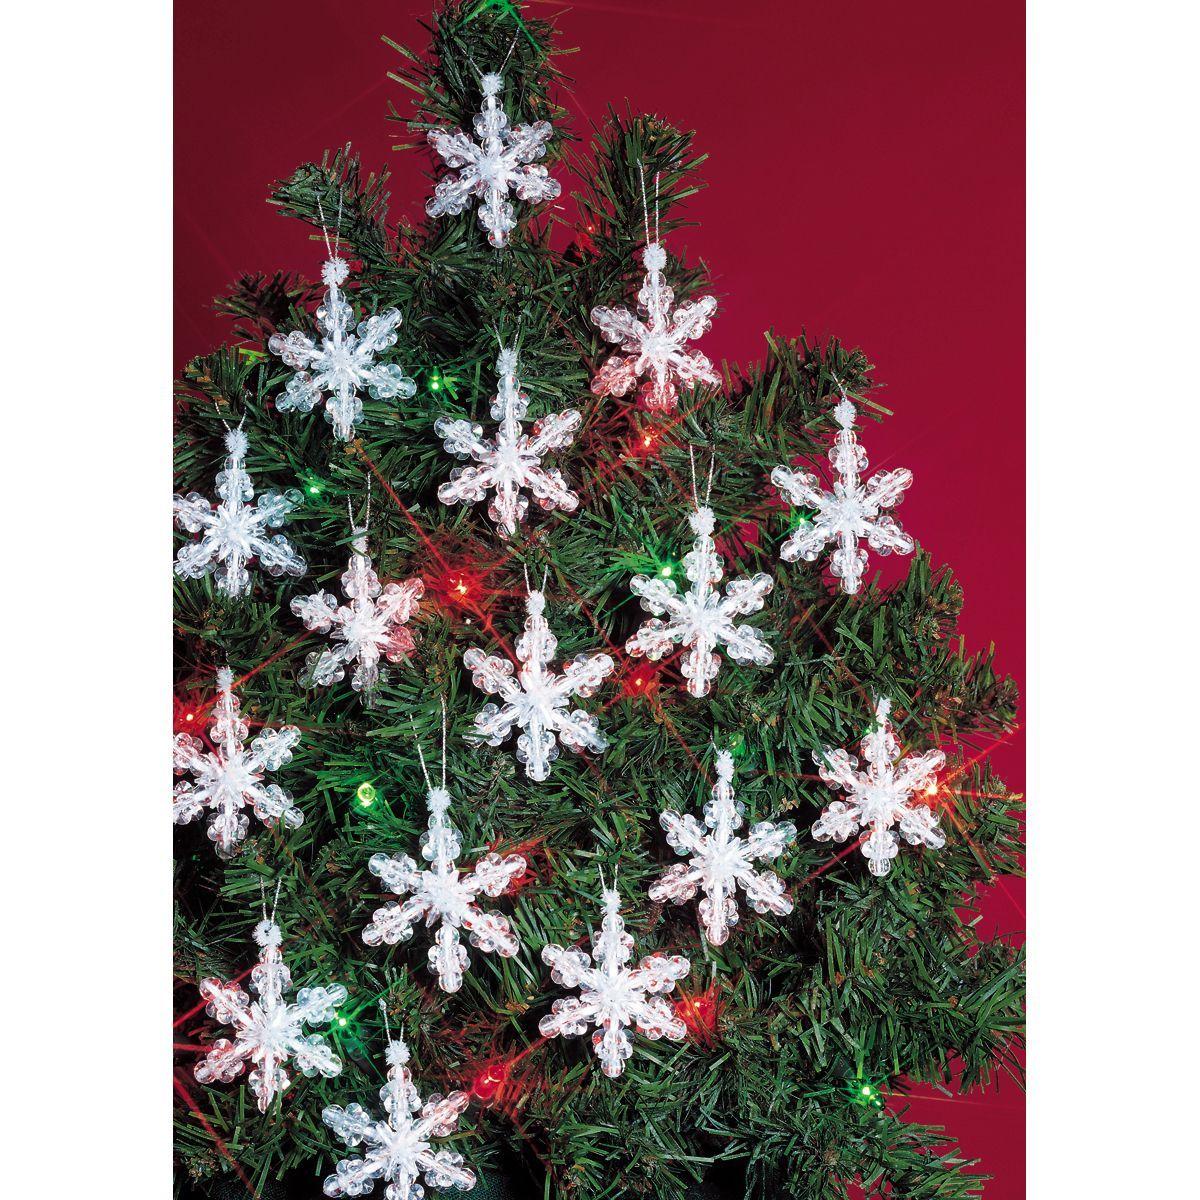 miniature paper craft model kit A Snowflake Christmas tree